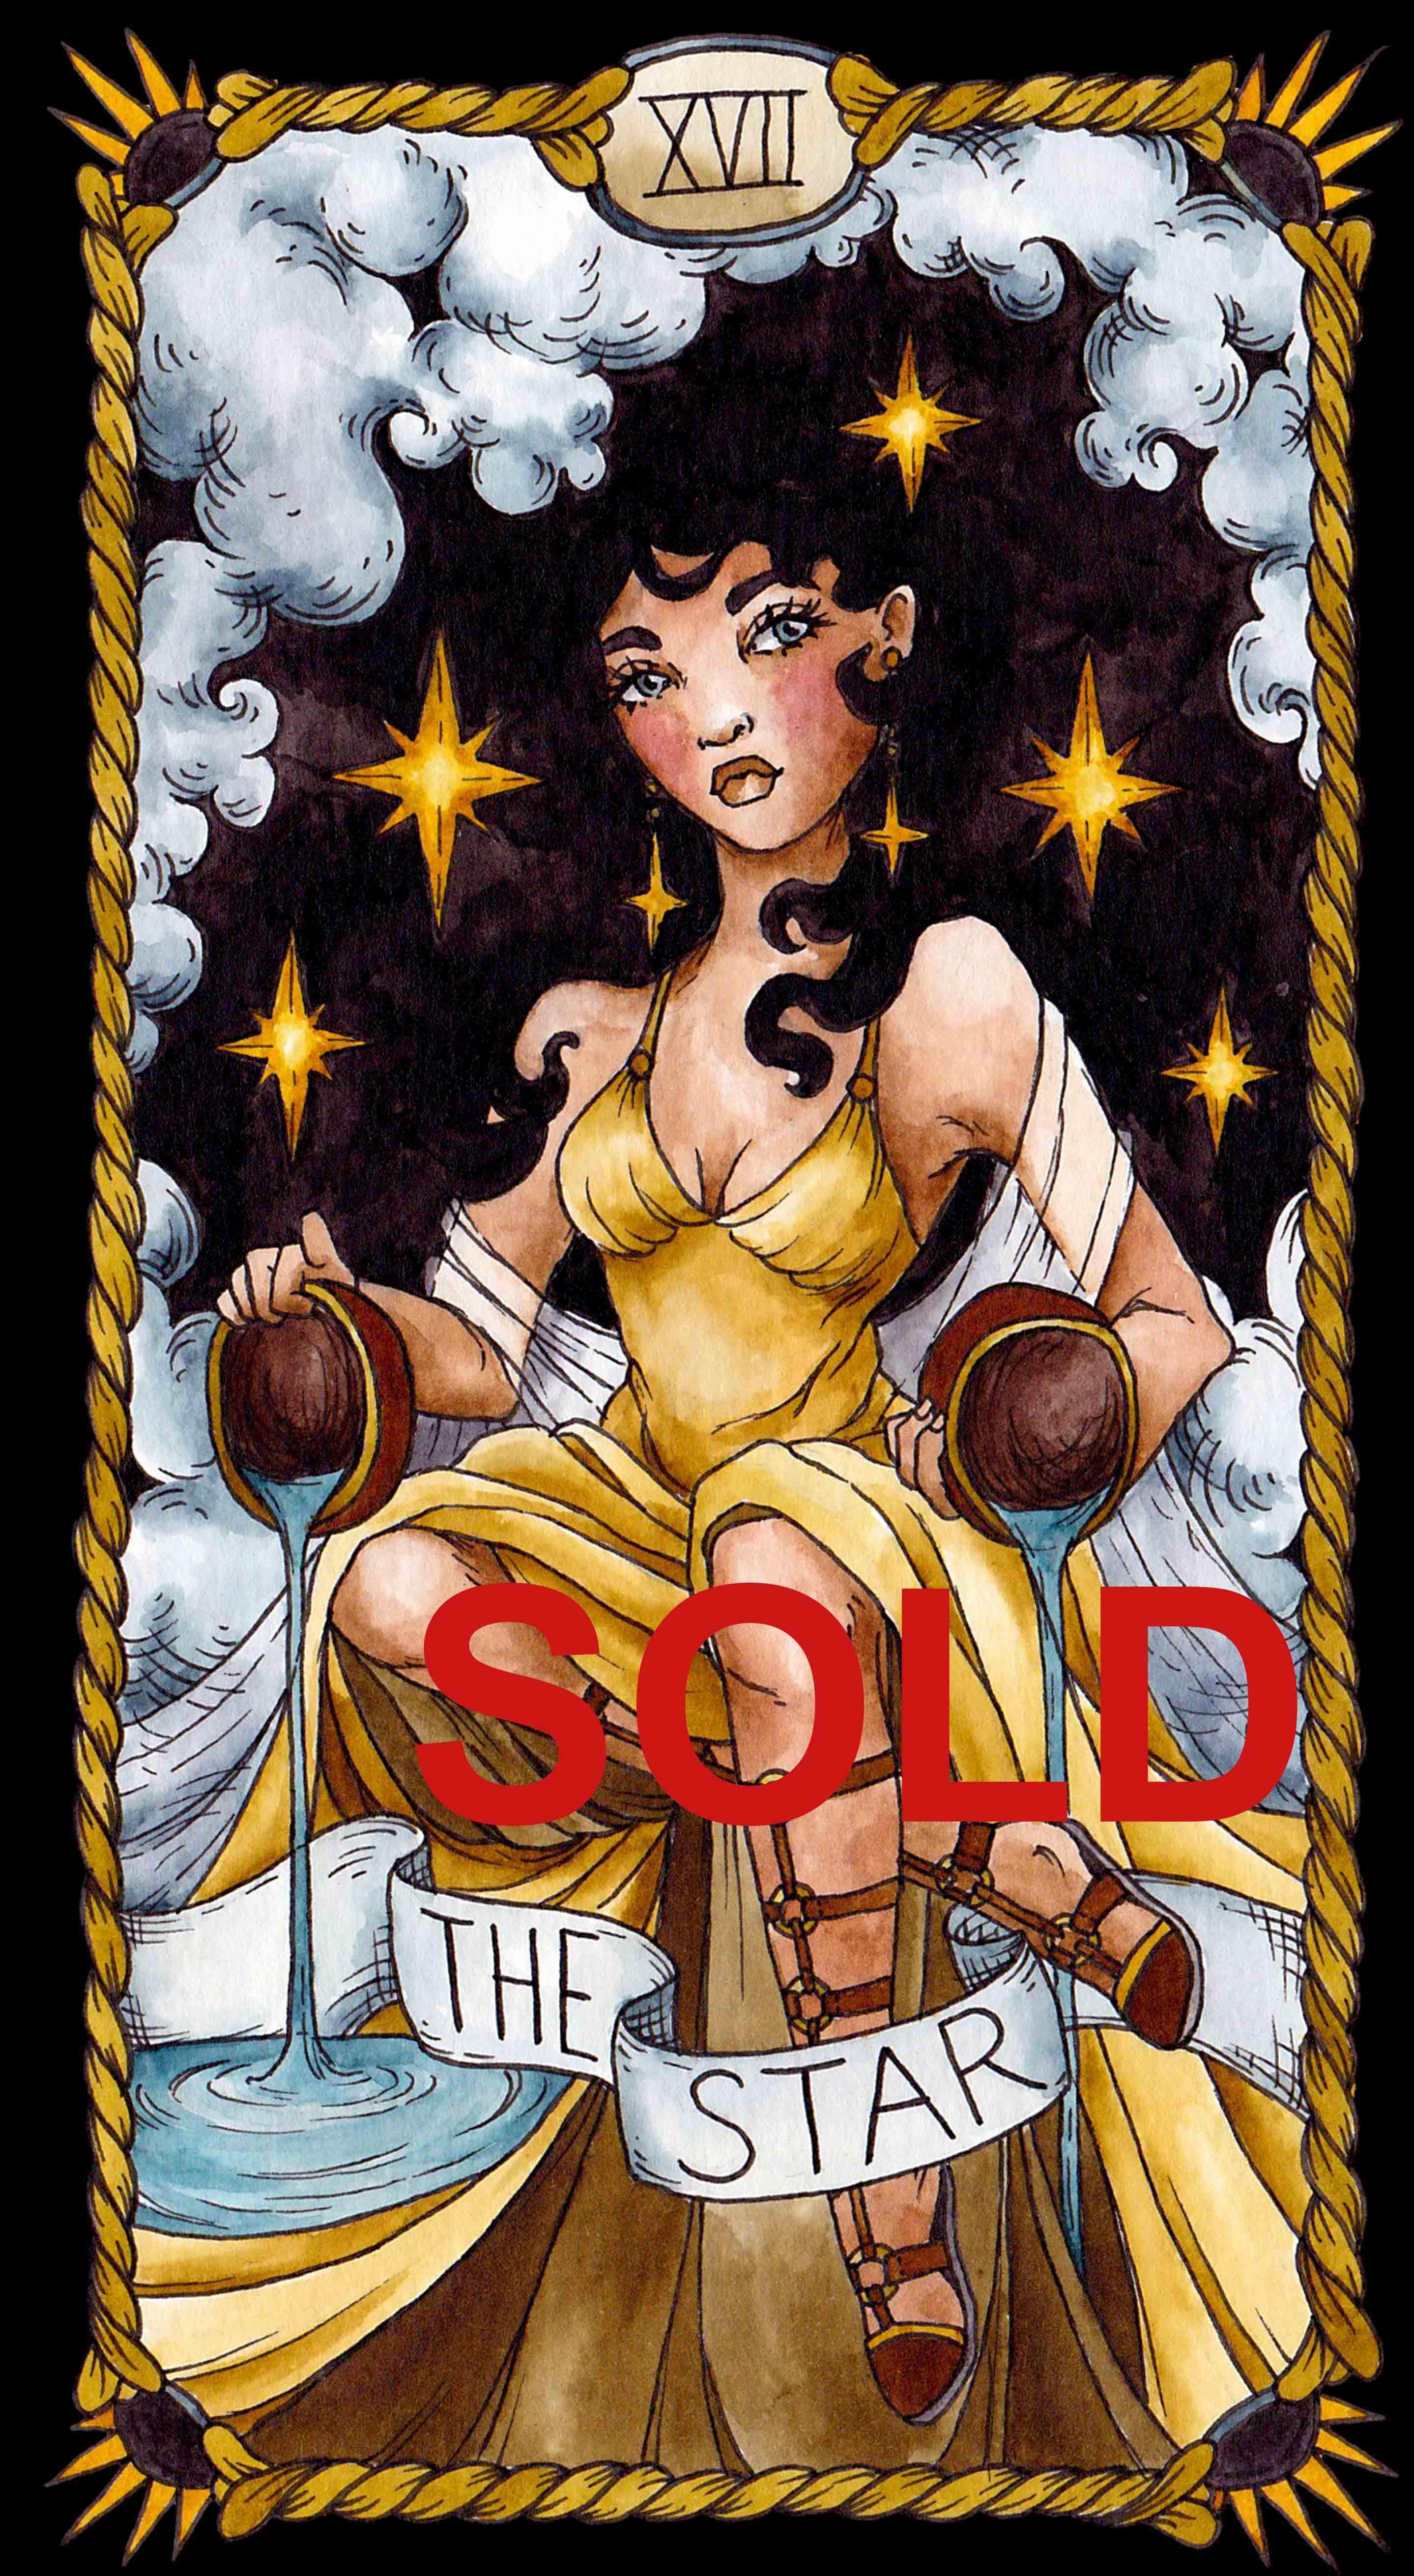 17.2 Star Sold